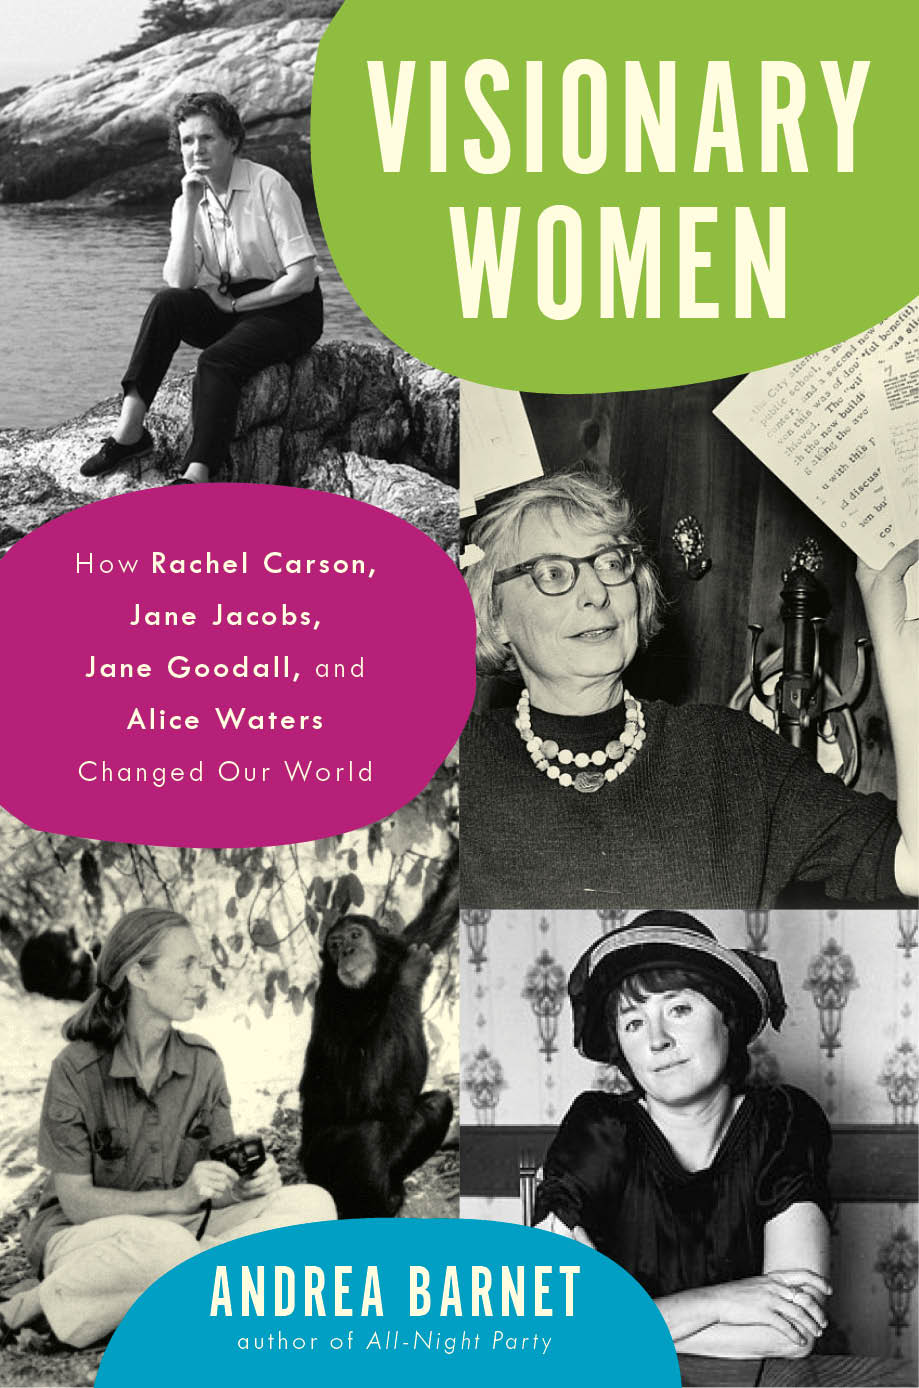 VisionaryWomen_cover.jpg